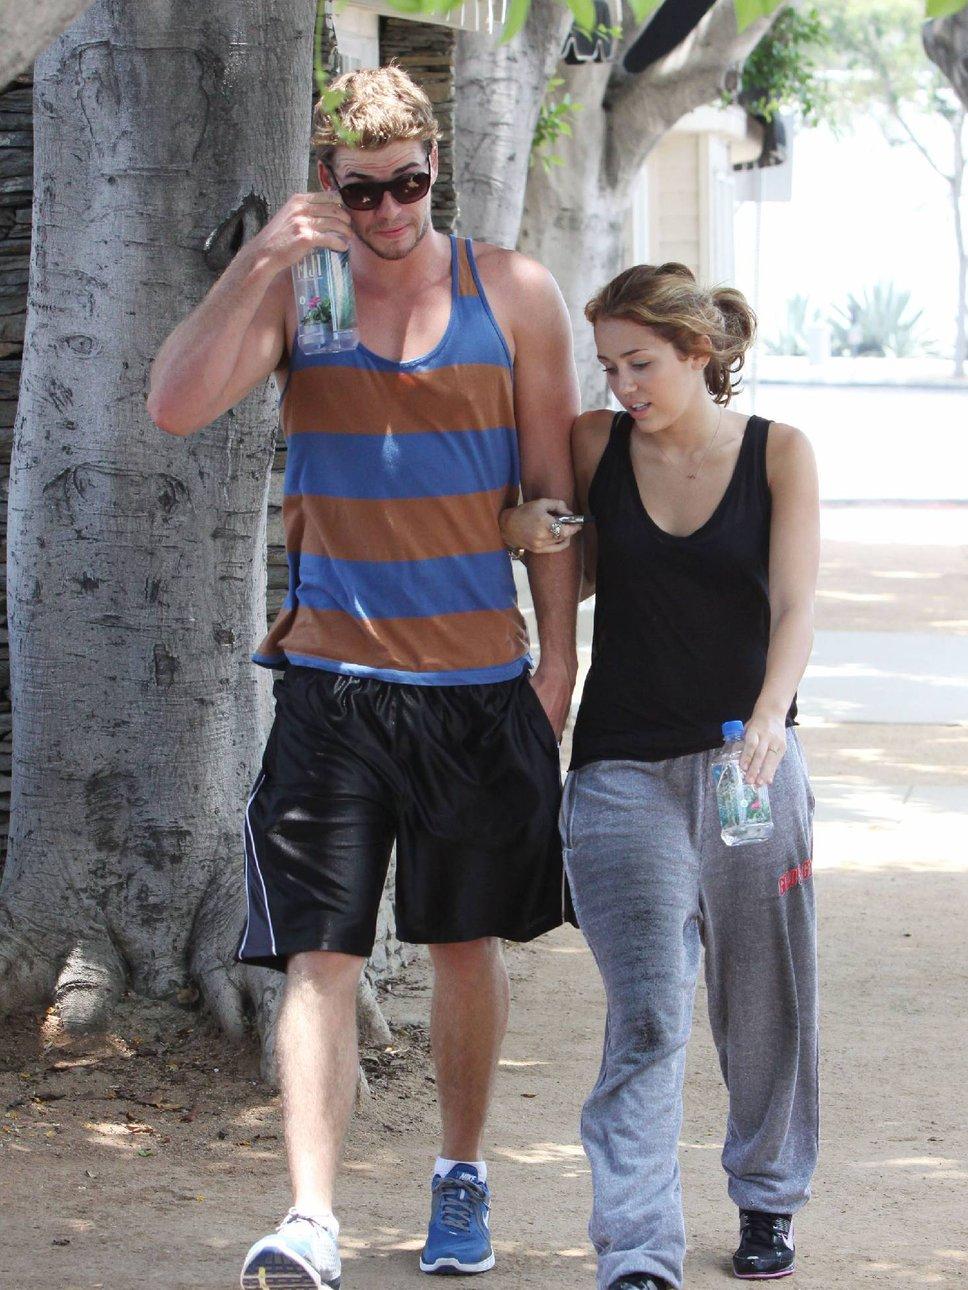 Liam Hemsworth Workout And Diet Secret